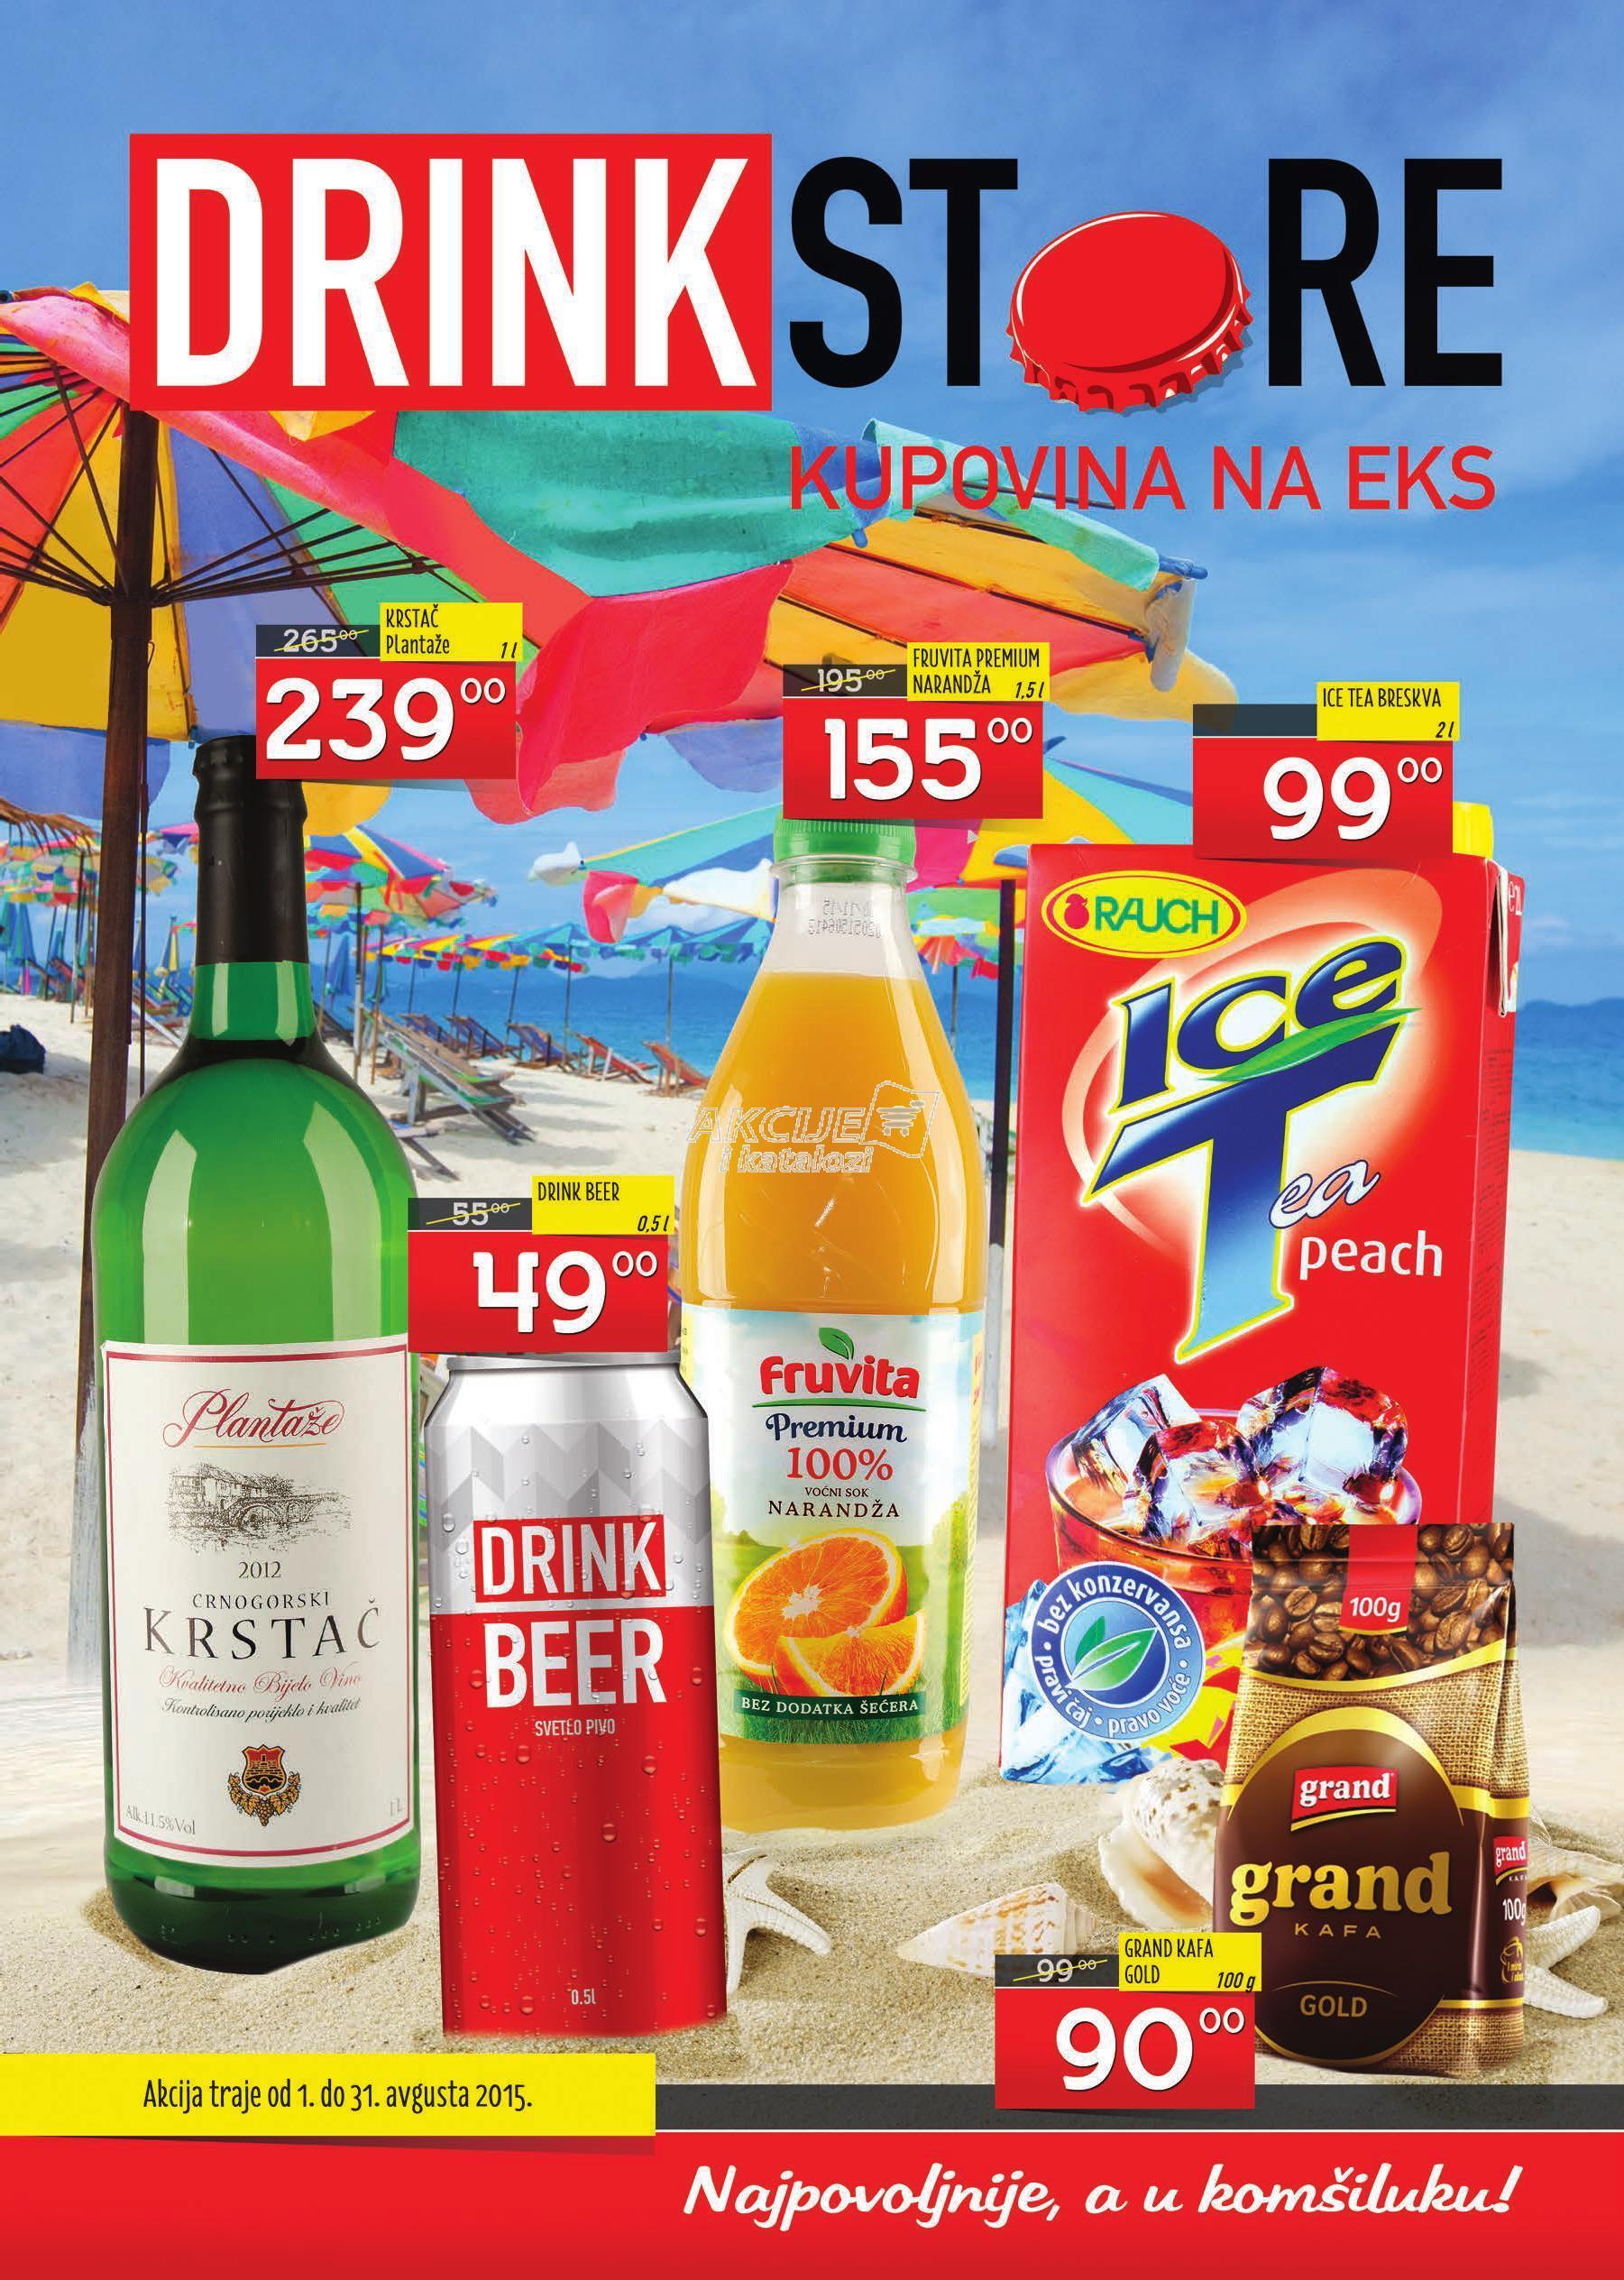 Drink Store - Redovna akcija super cena